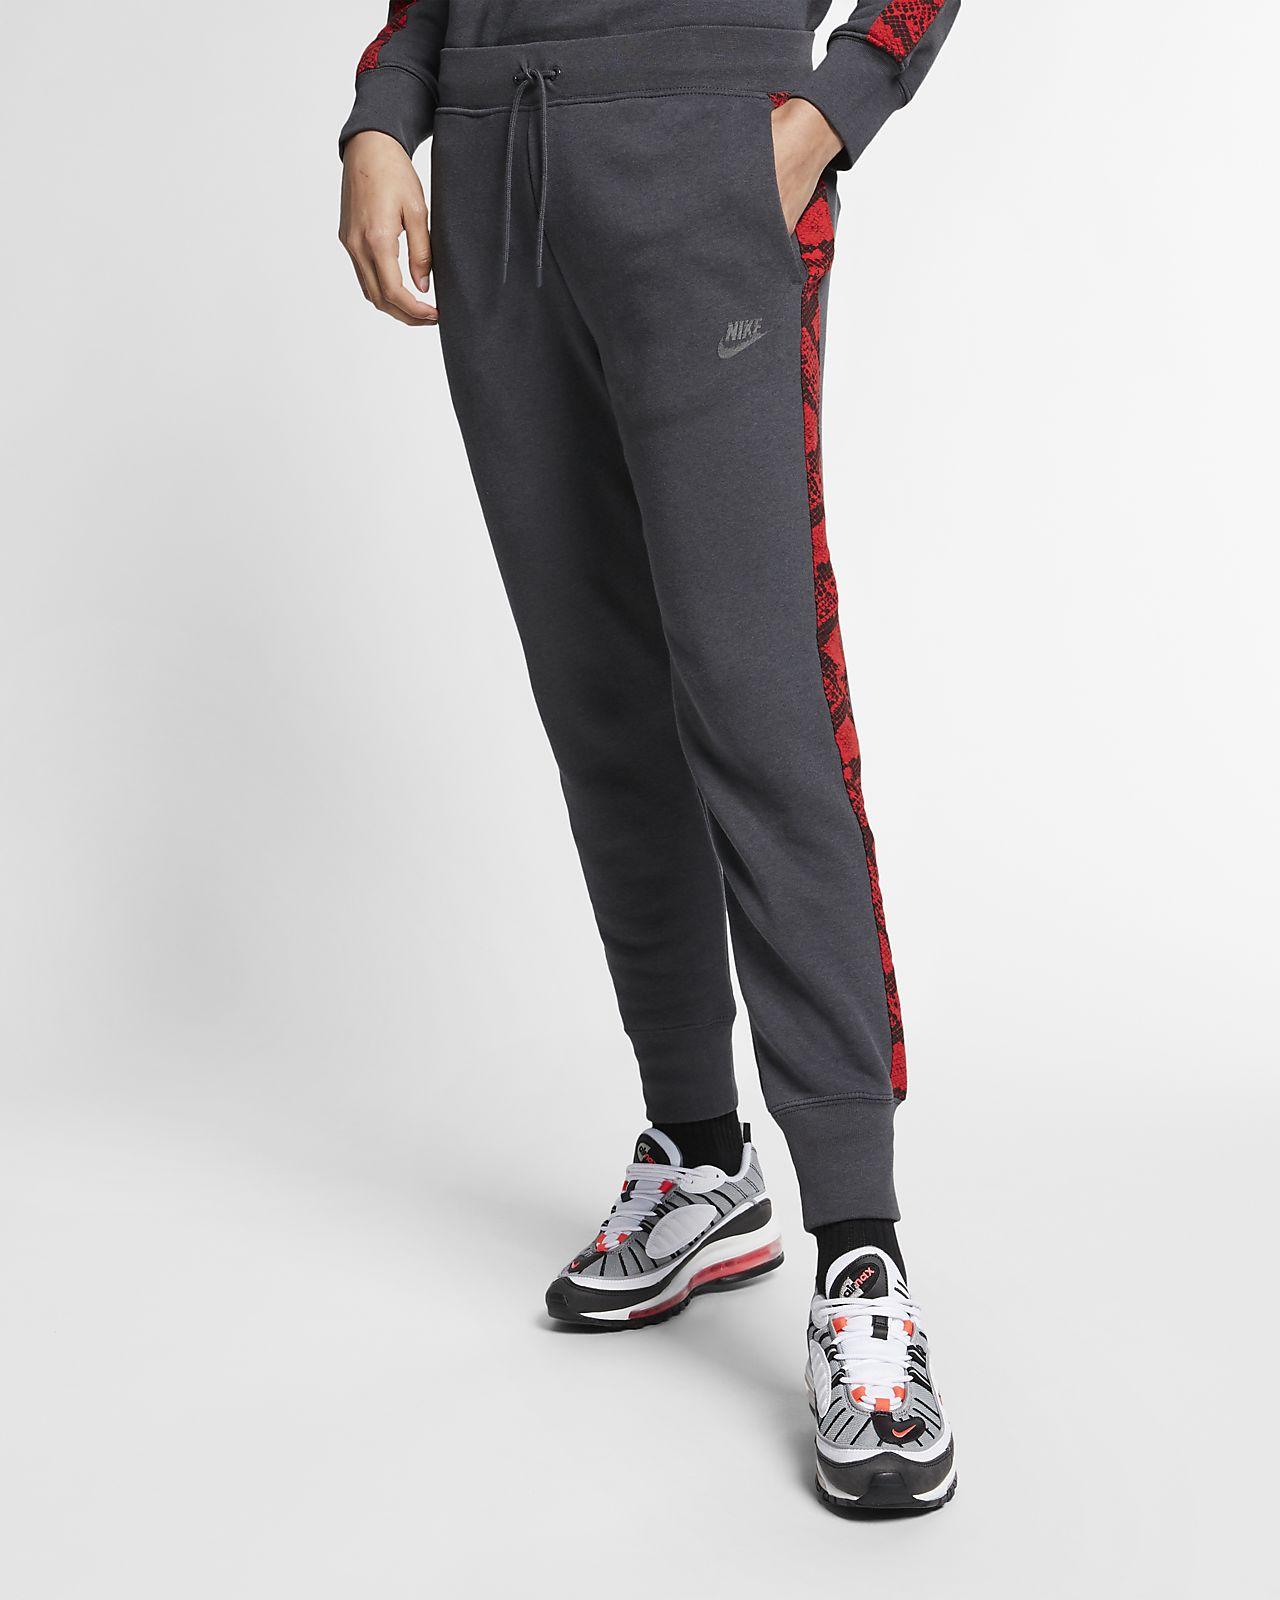 d33be16ec3 Pantaloni animalier Nike Sportswear - Donna. Nike.com IT